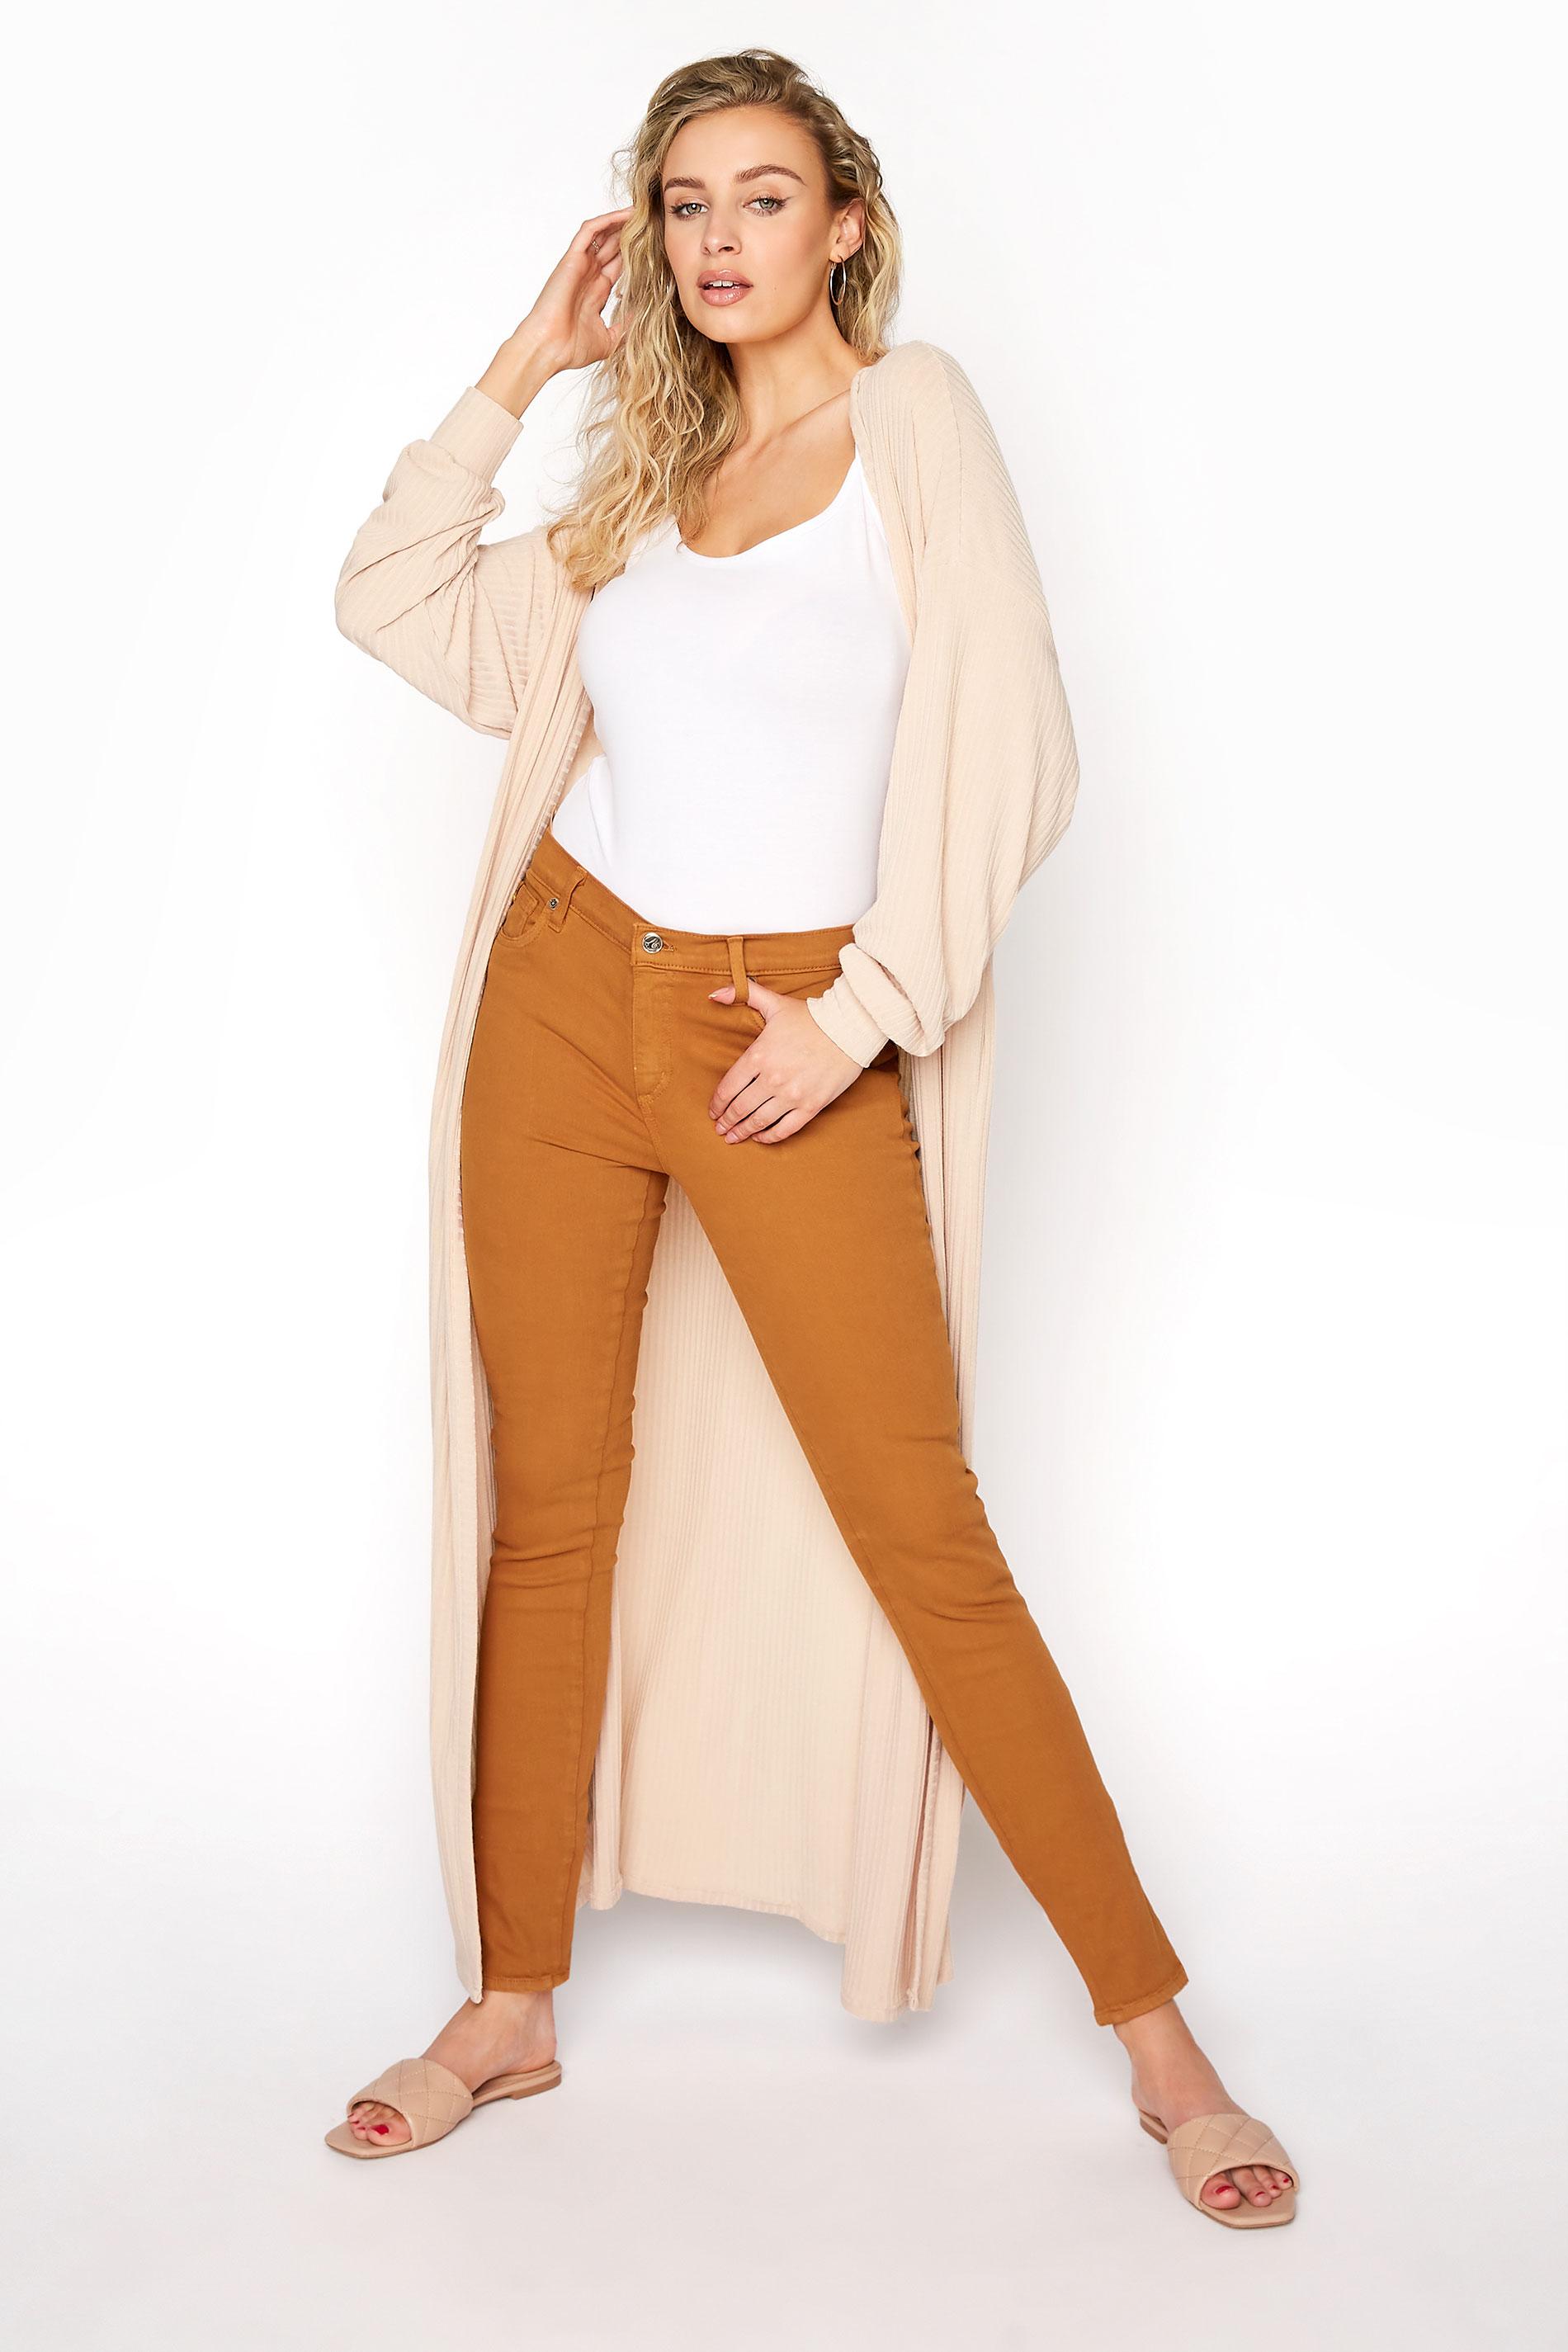 YOGA JEANS Rust Rachel Skinny Jeans_A.jpg